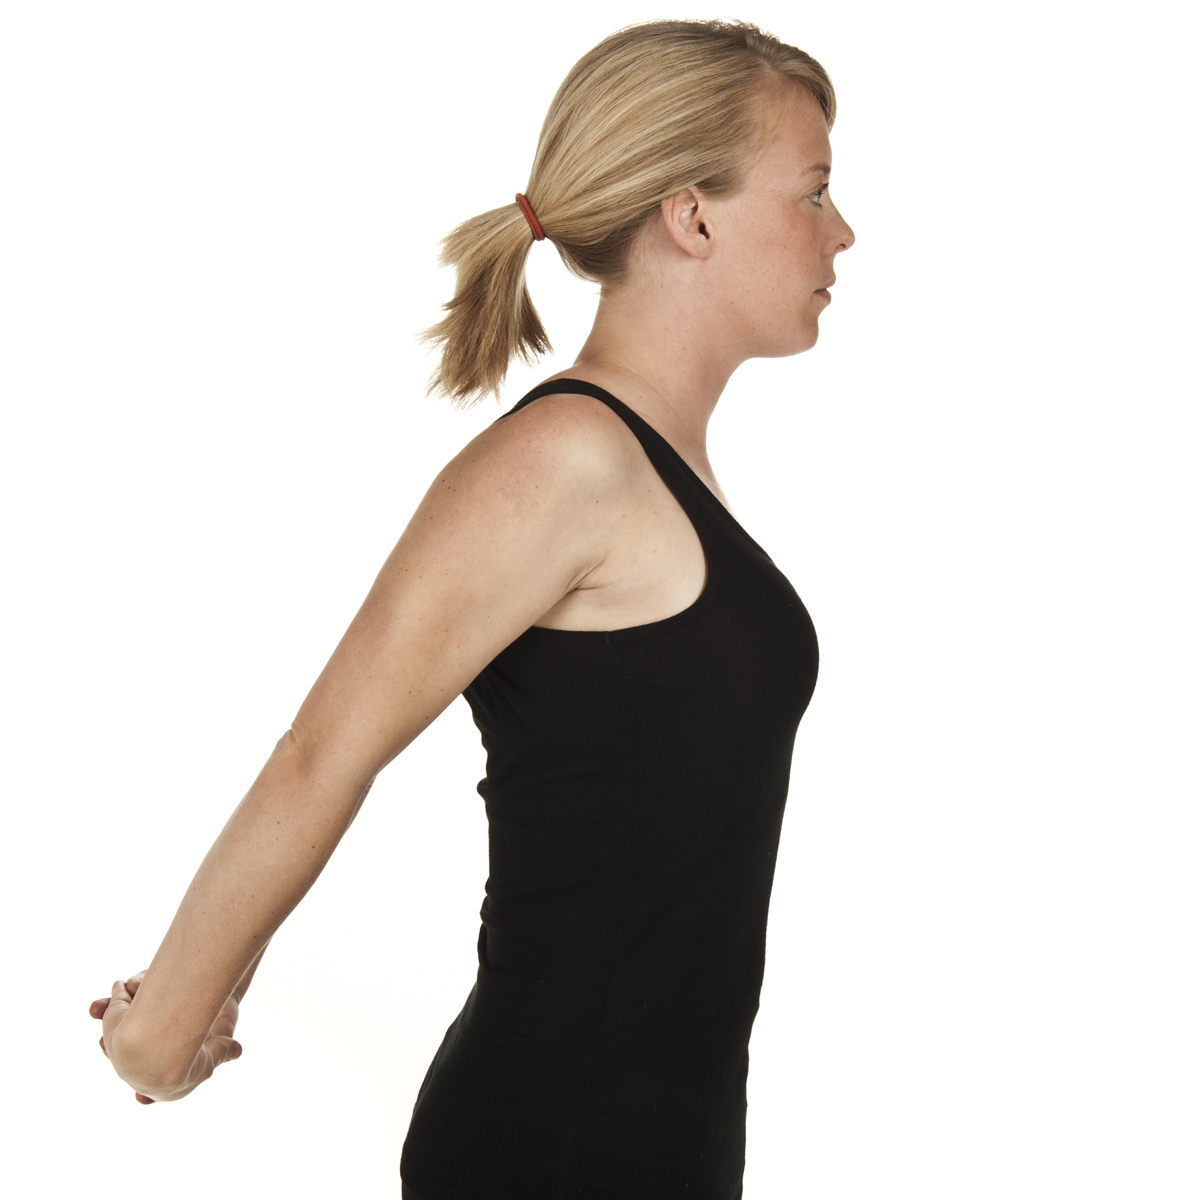 bicep stretch - photo #37